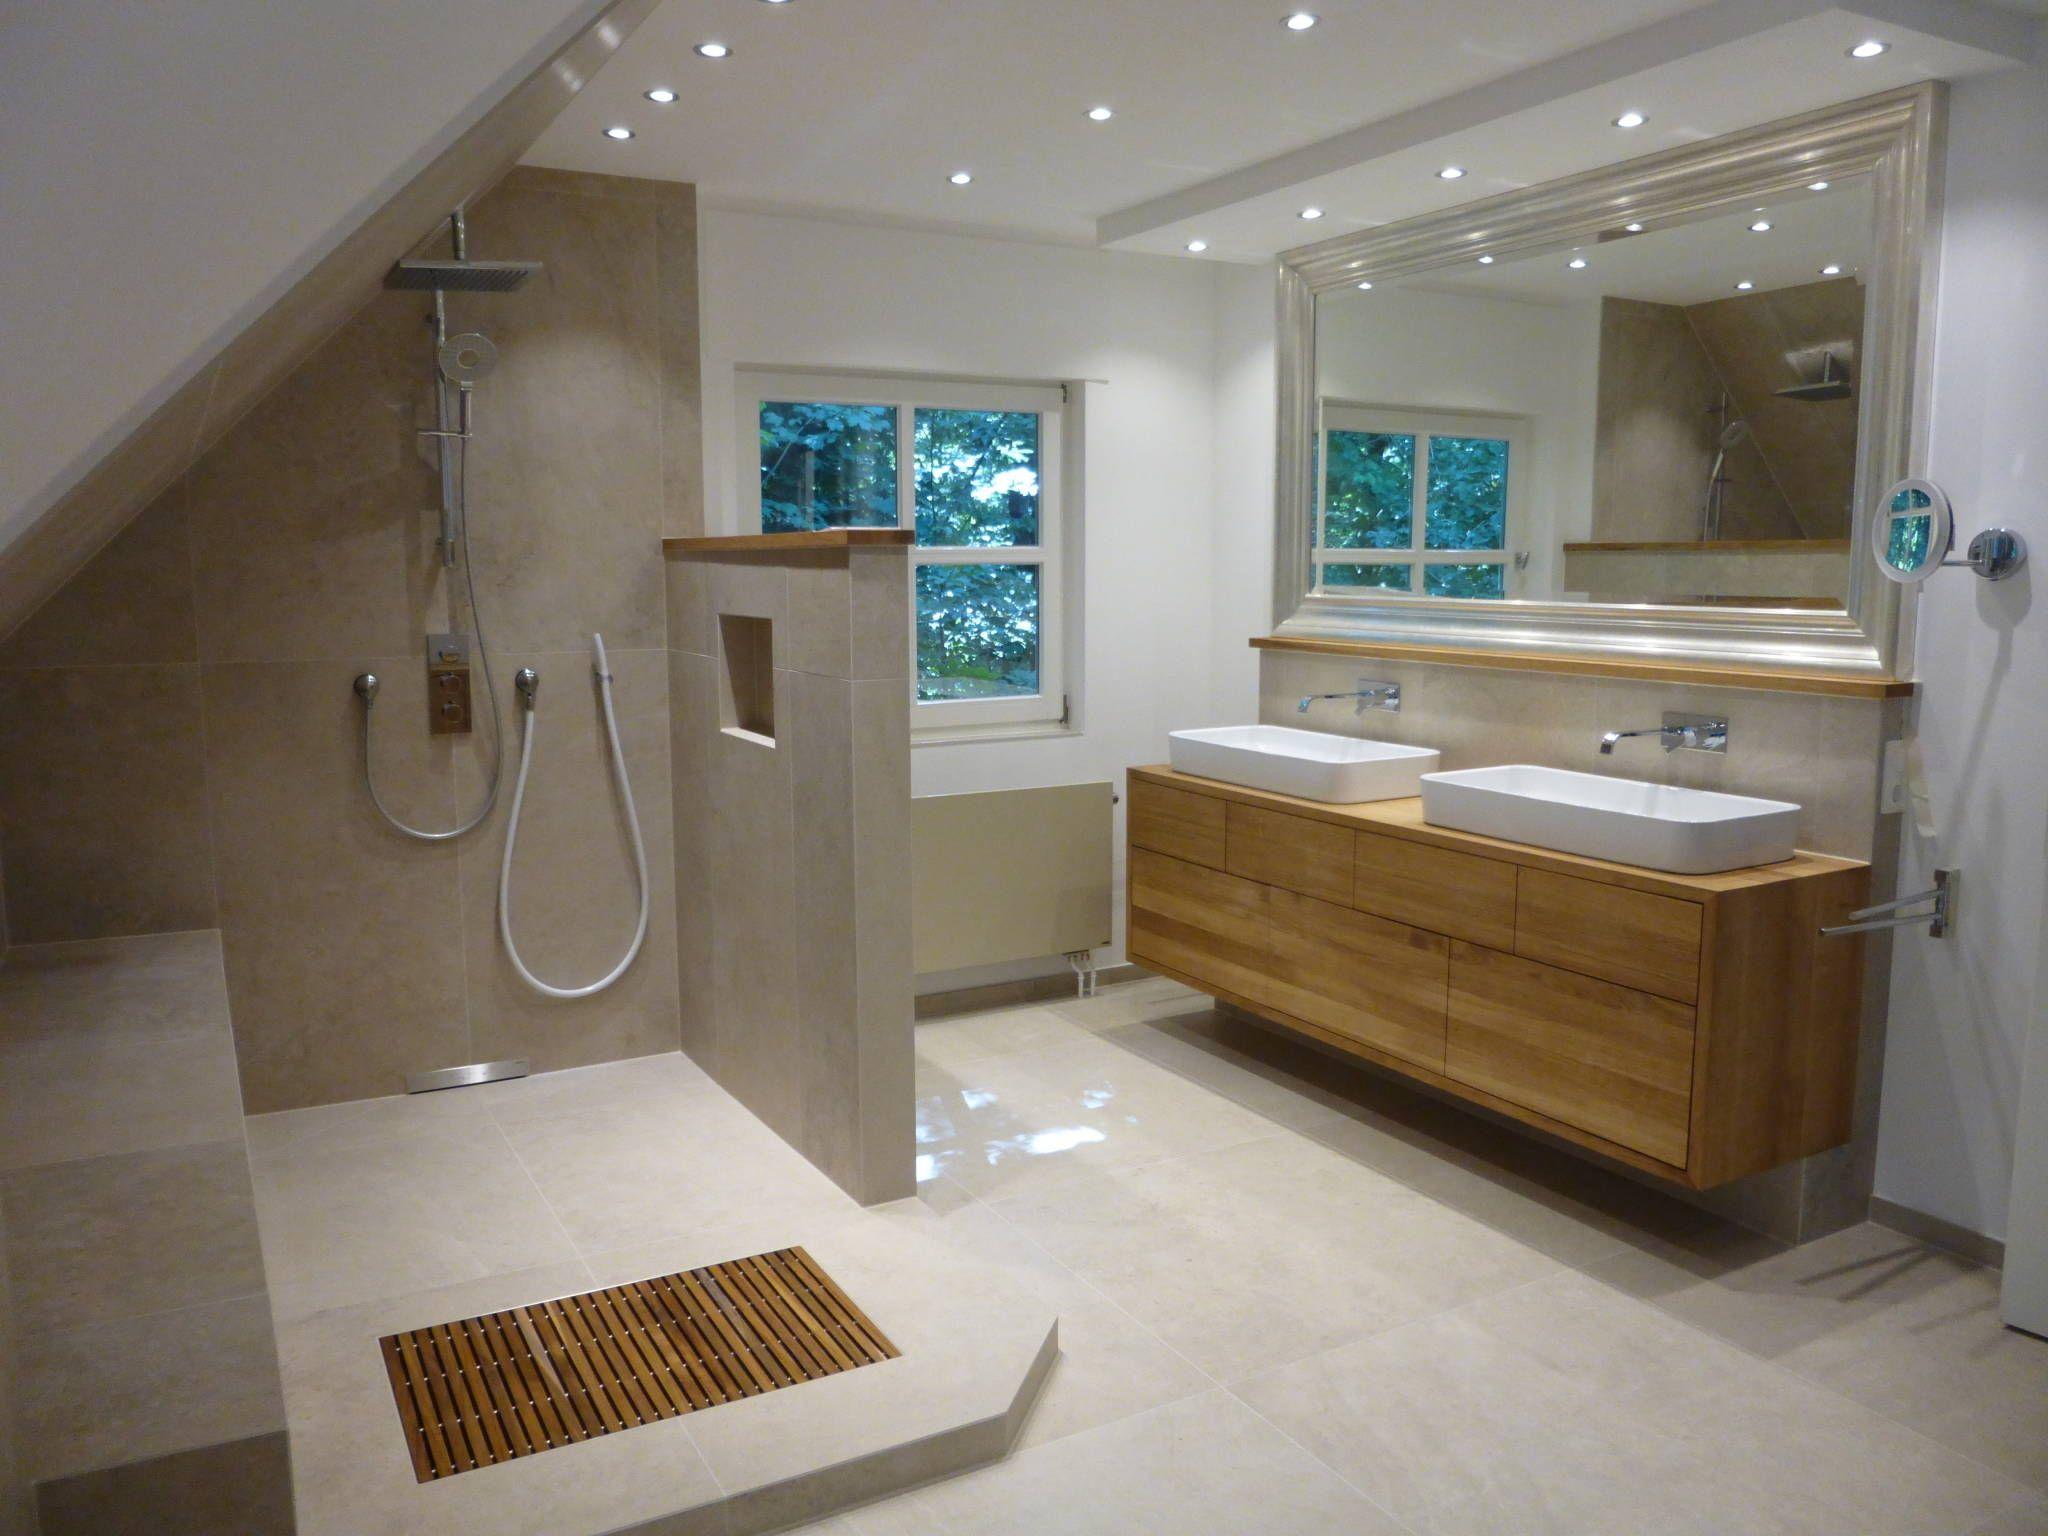 Wellness Bad Badezimmer Badezimmerideen Badezimmer Design